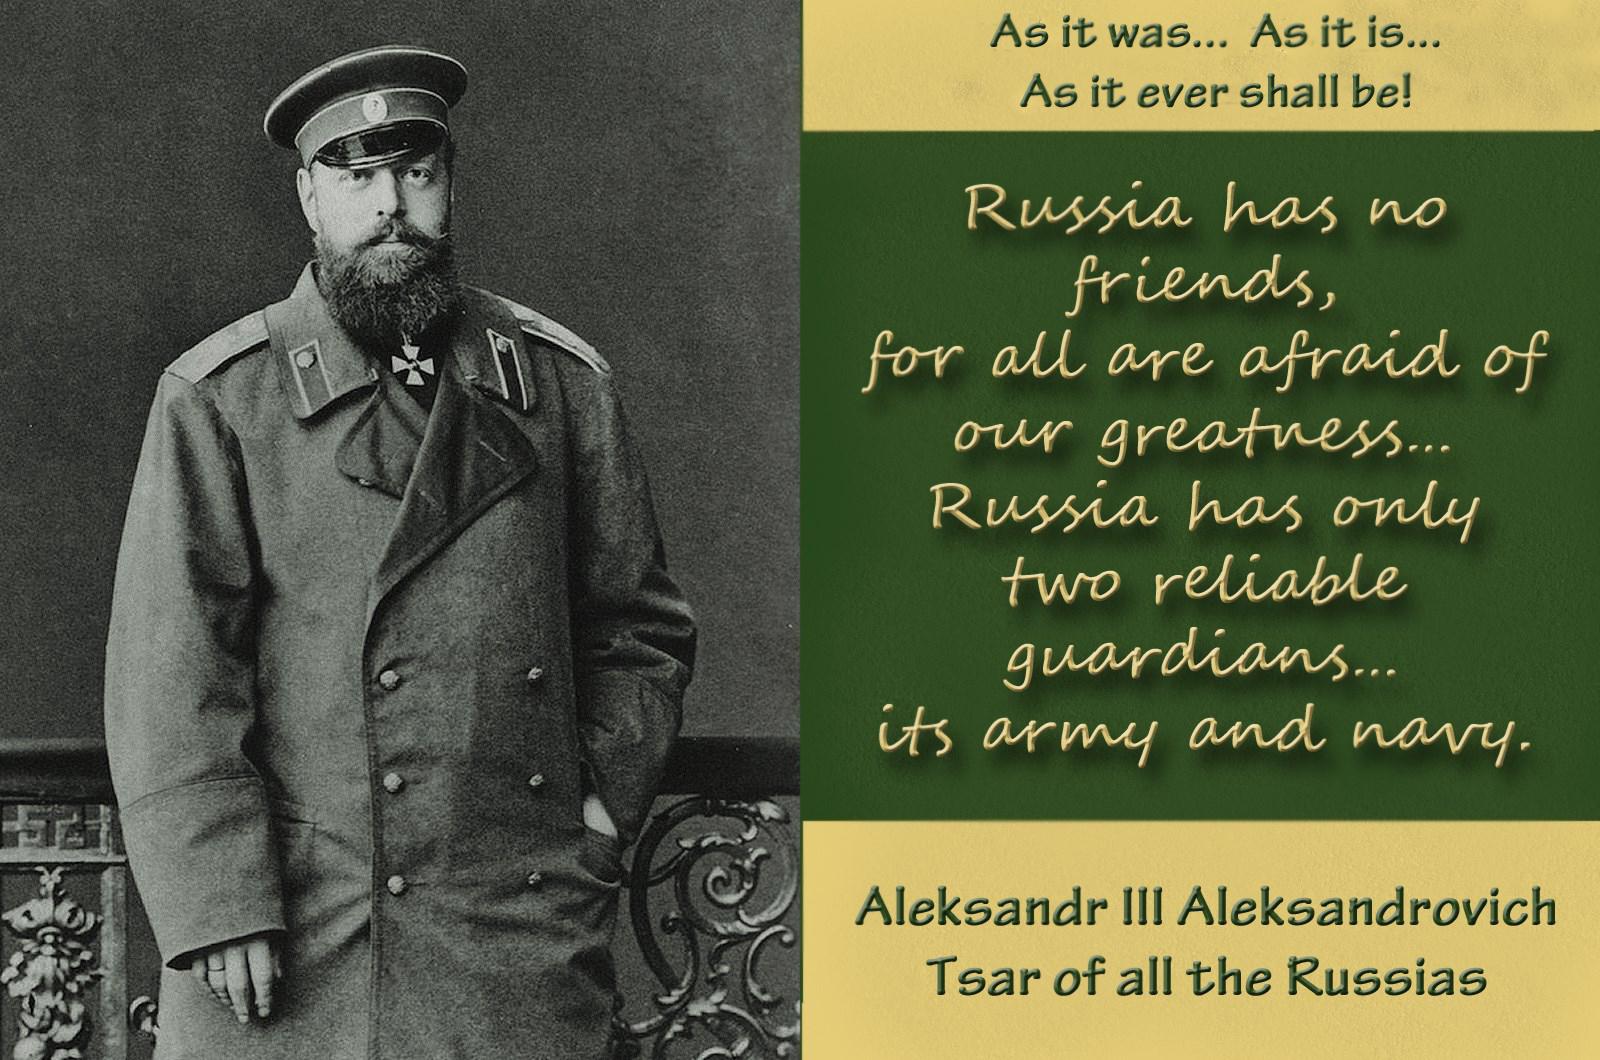 00 tsar aleksandr. two guardians. 170715